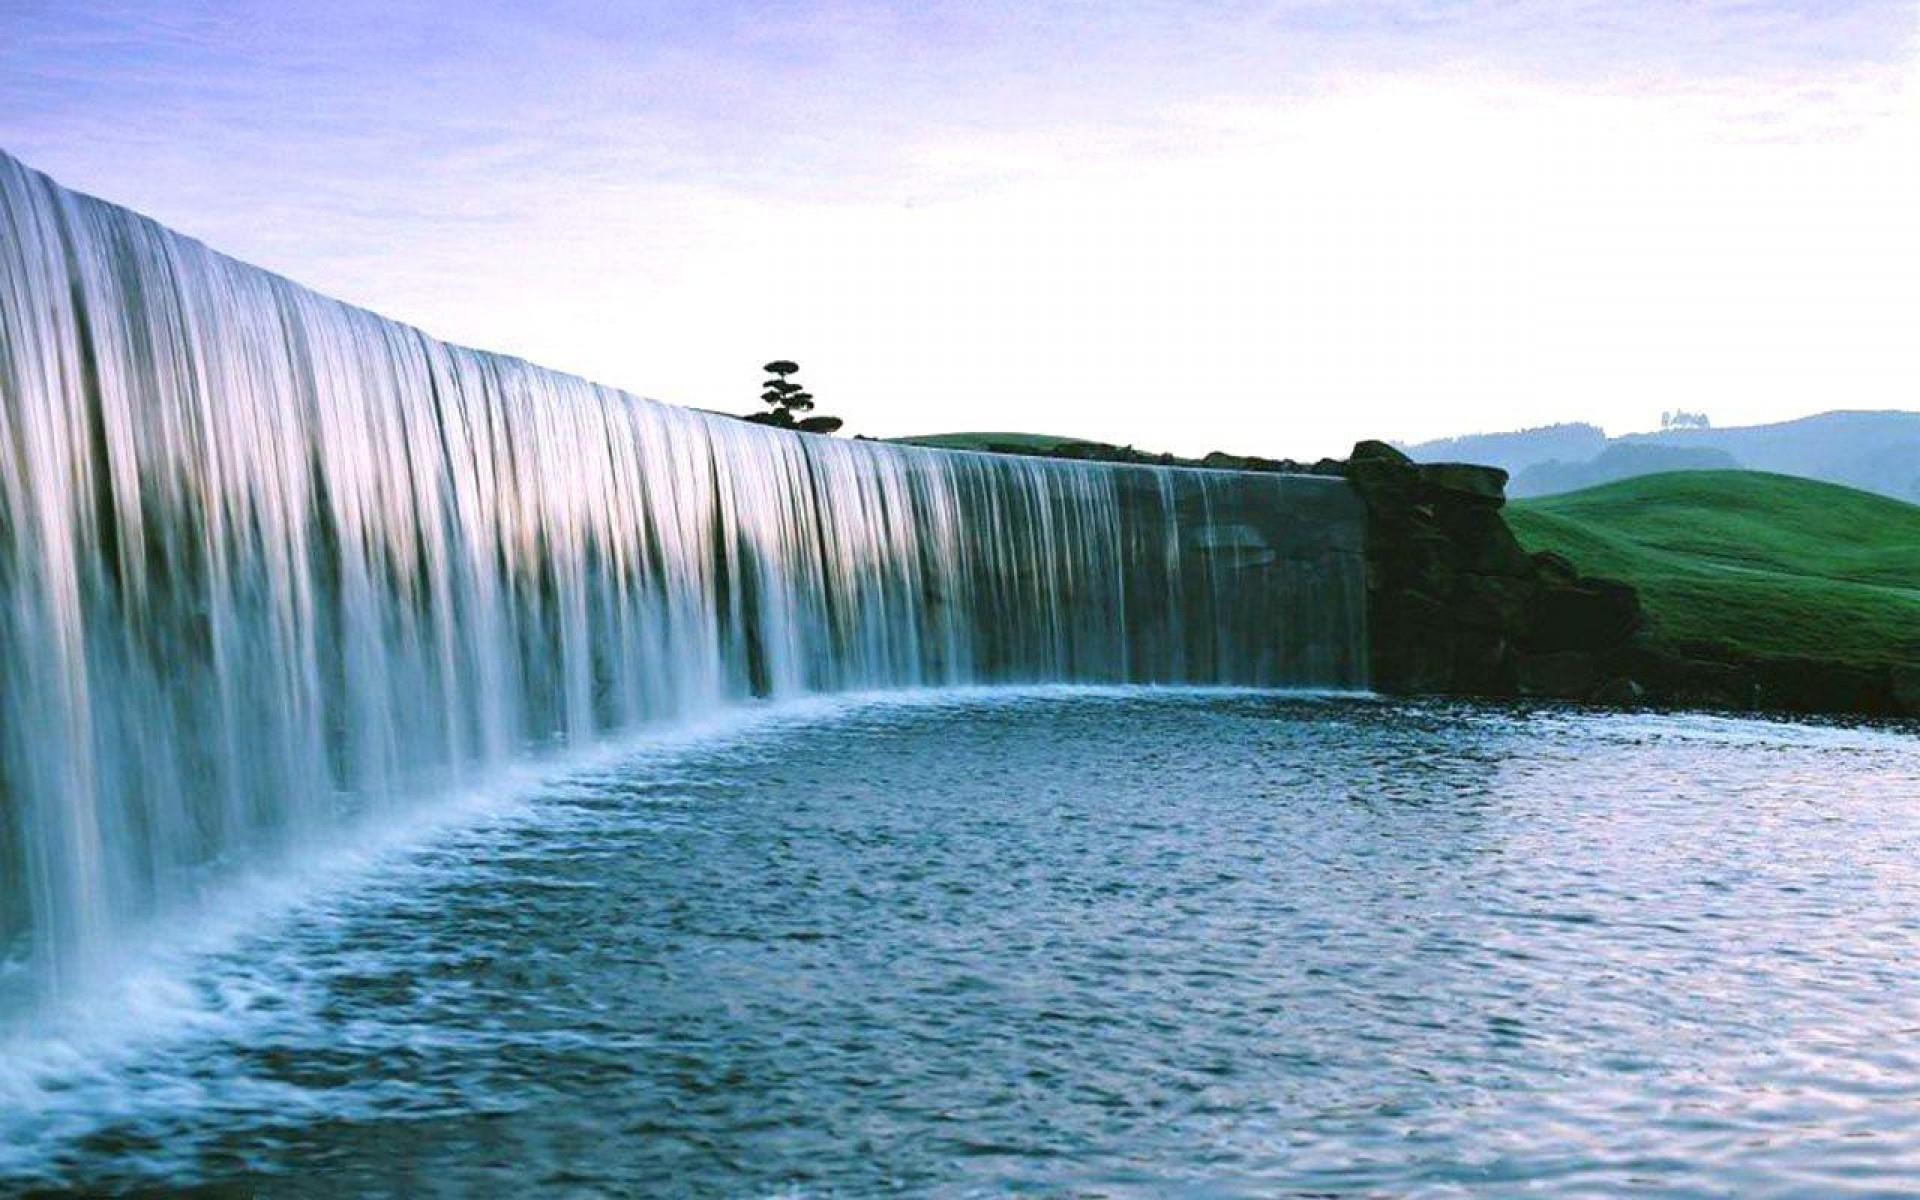 waterfall-wallpaper-fullscreen - wallpaper.wiki